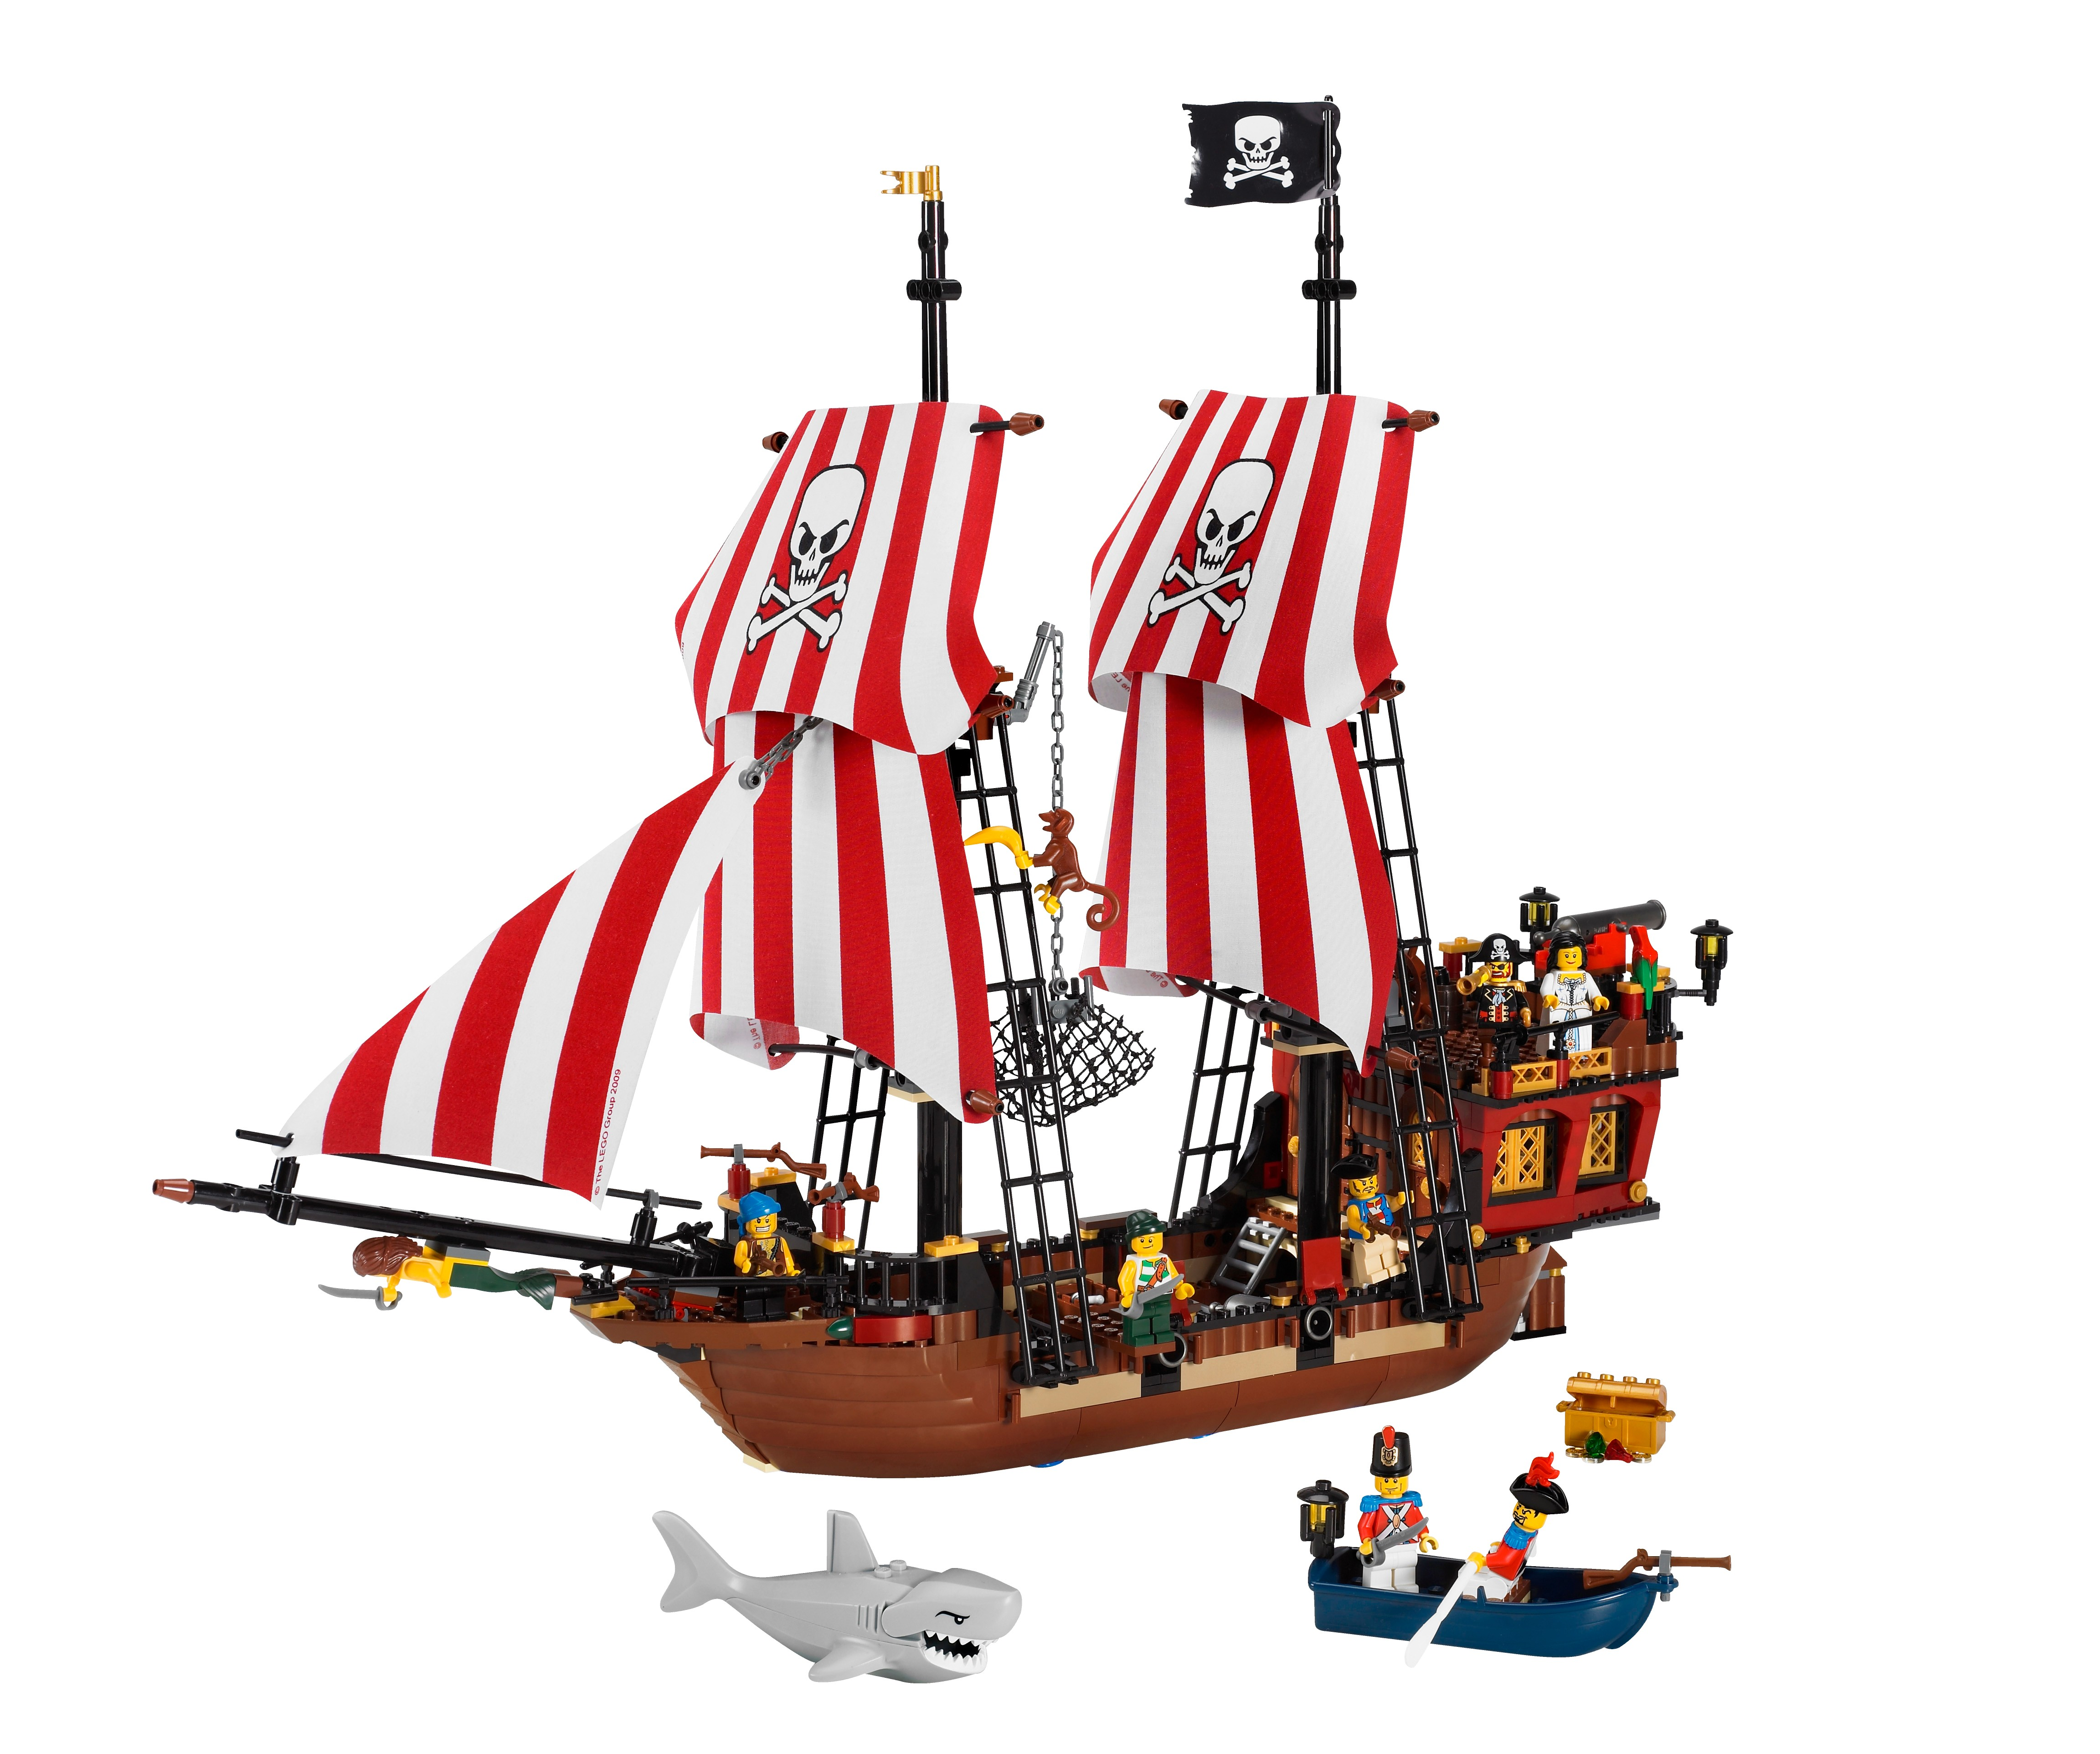 6243 LEGO Brickbeard's Bounty